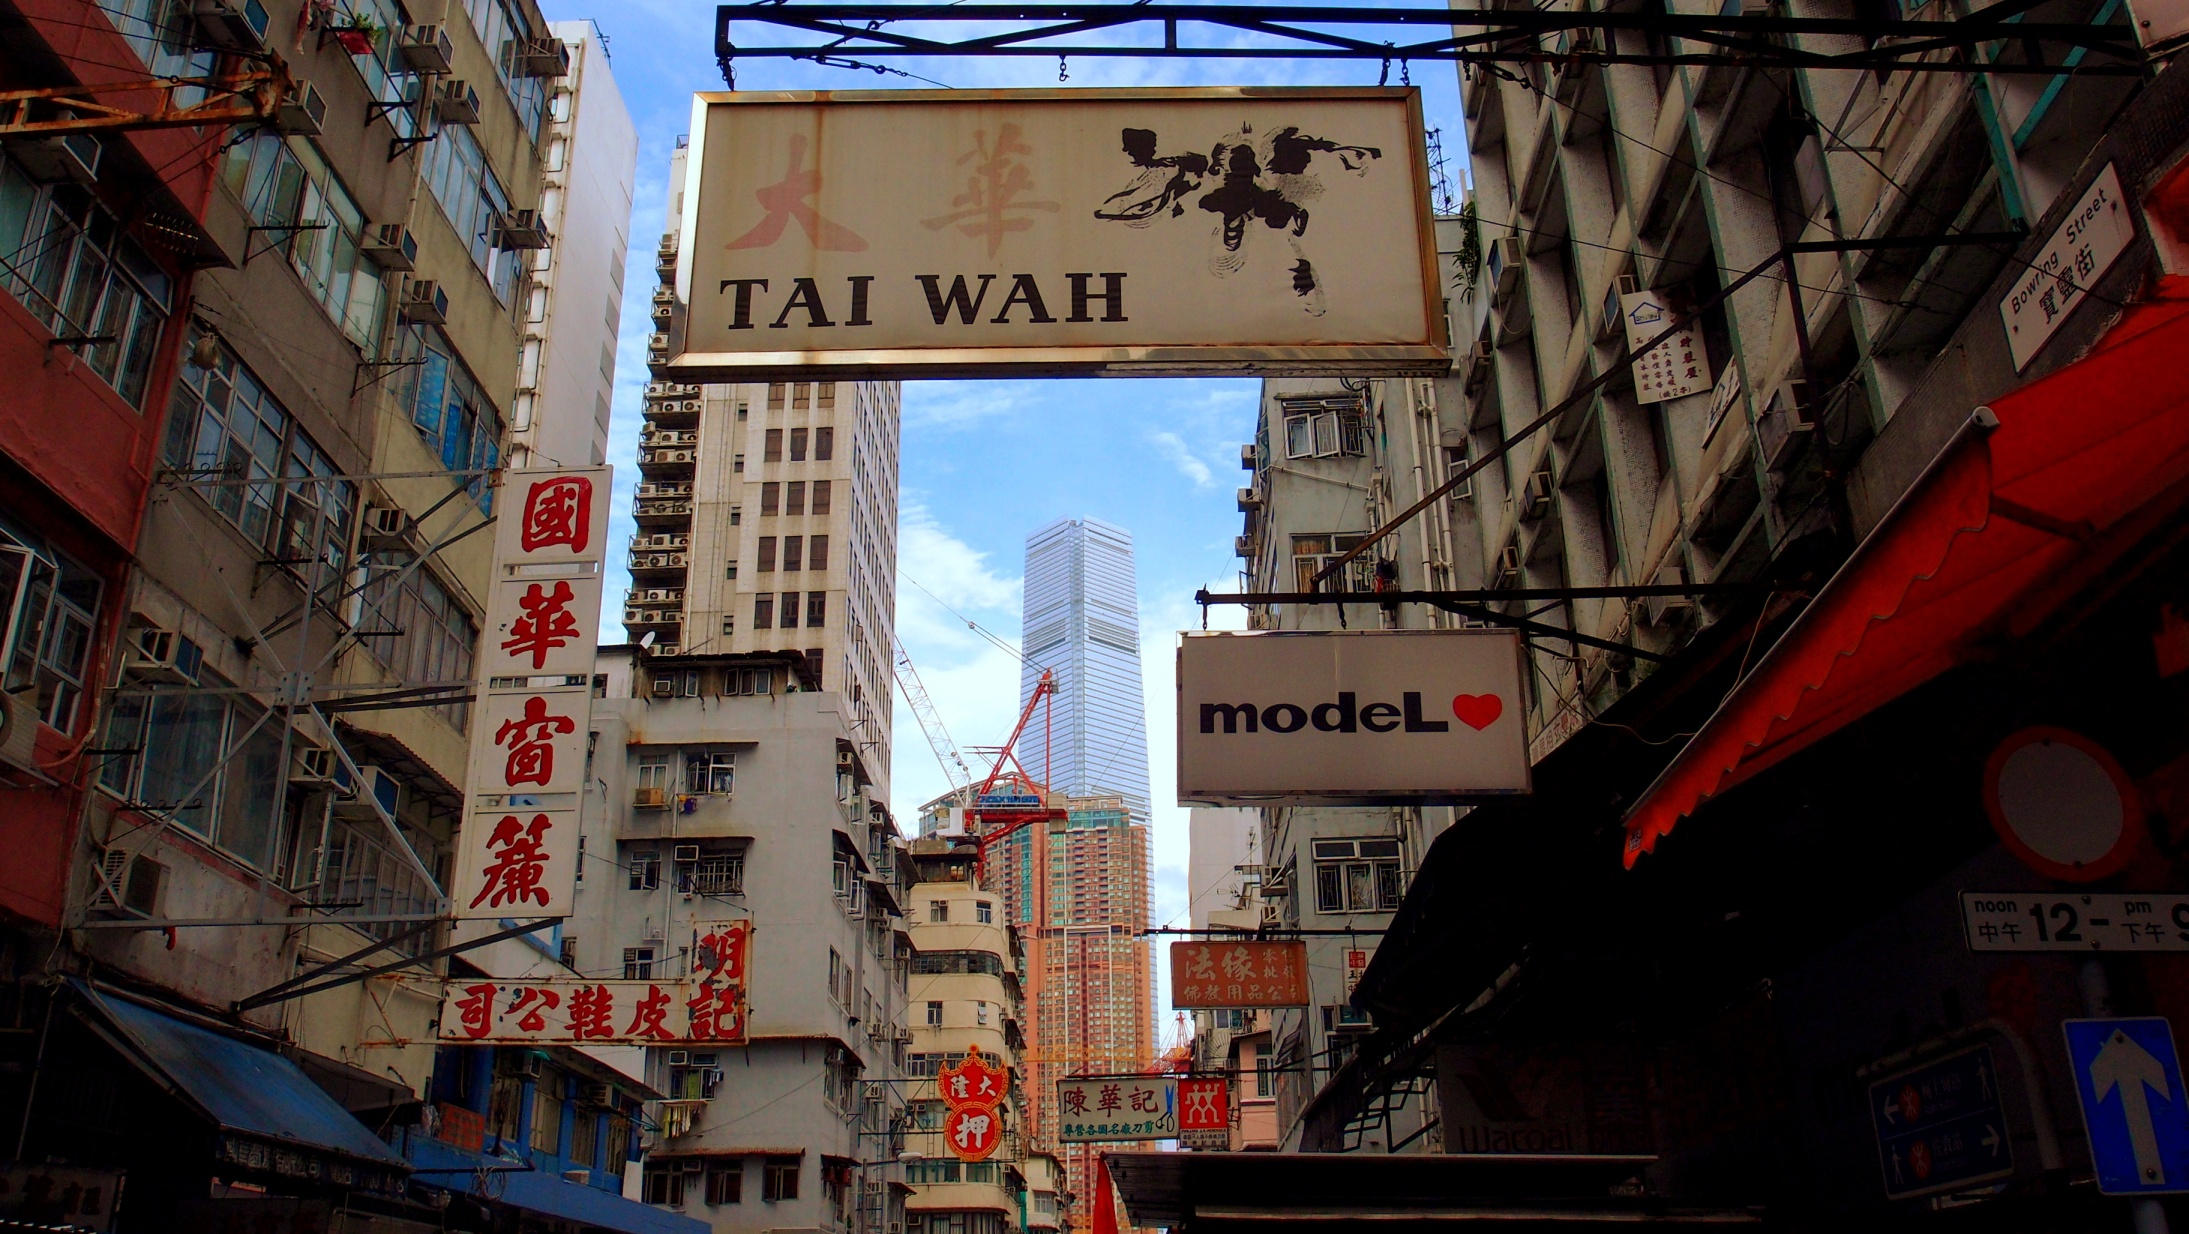 ICC, 118 floors, dominating Kowloon